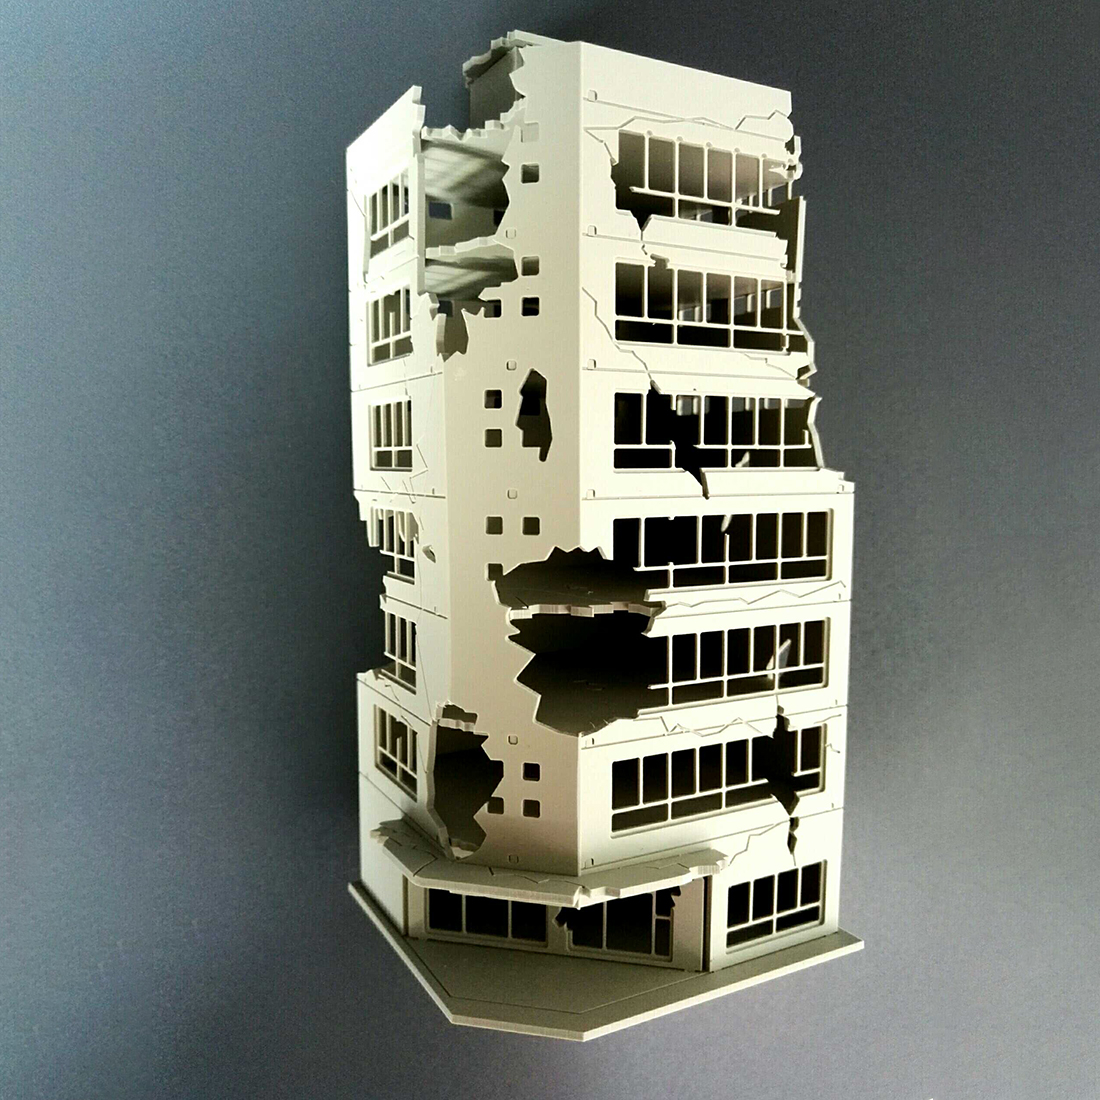 NFSTRIKE 1:100 / 1:144 Sand Table Ruined Building Model Battle Damaged Building Model - Battle Damaged Version